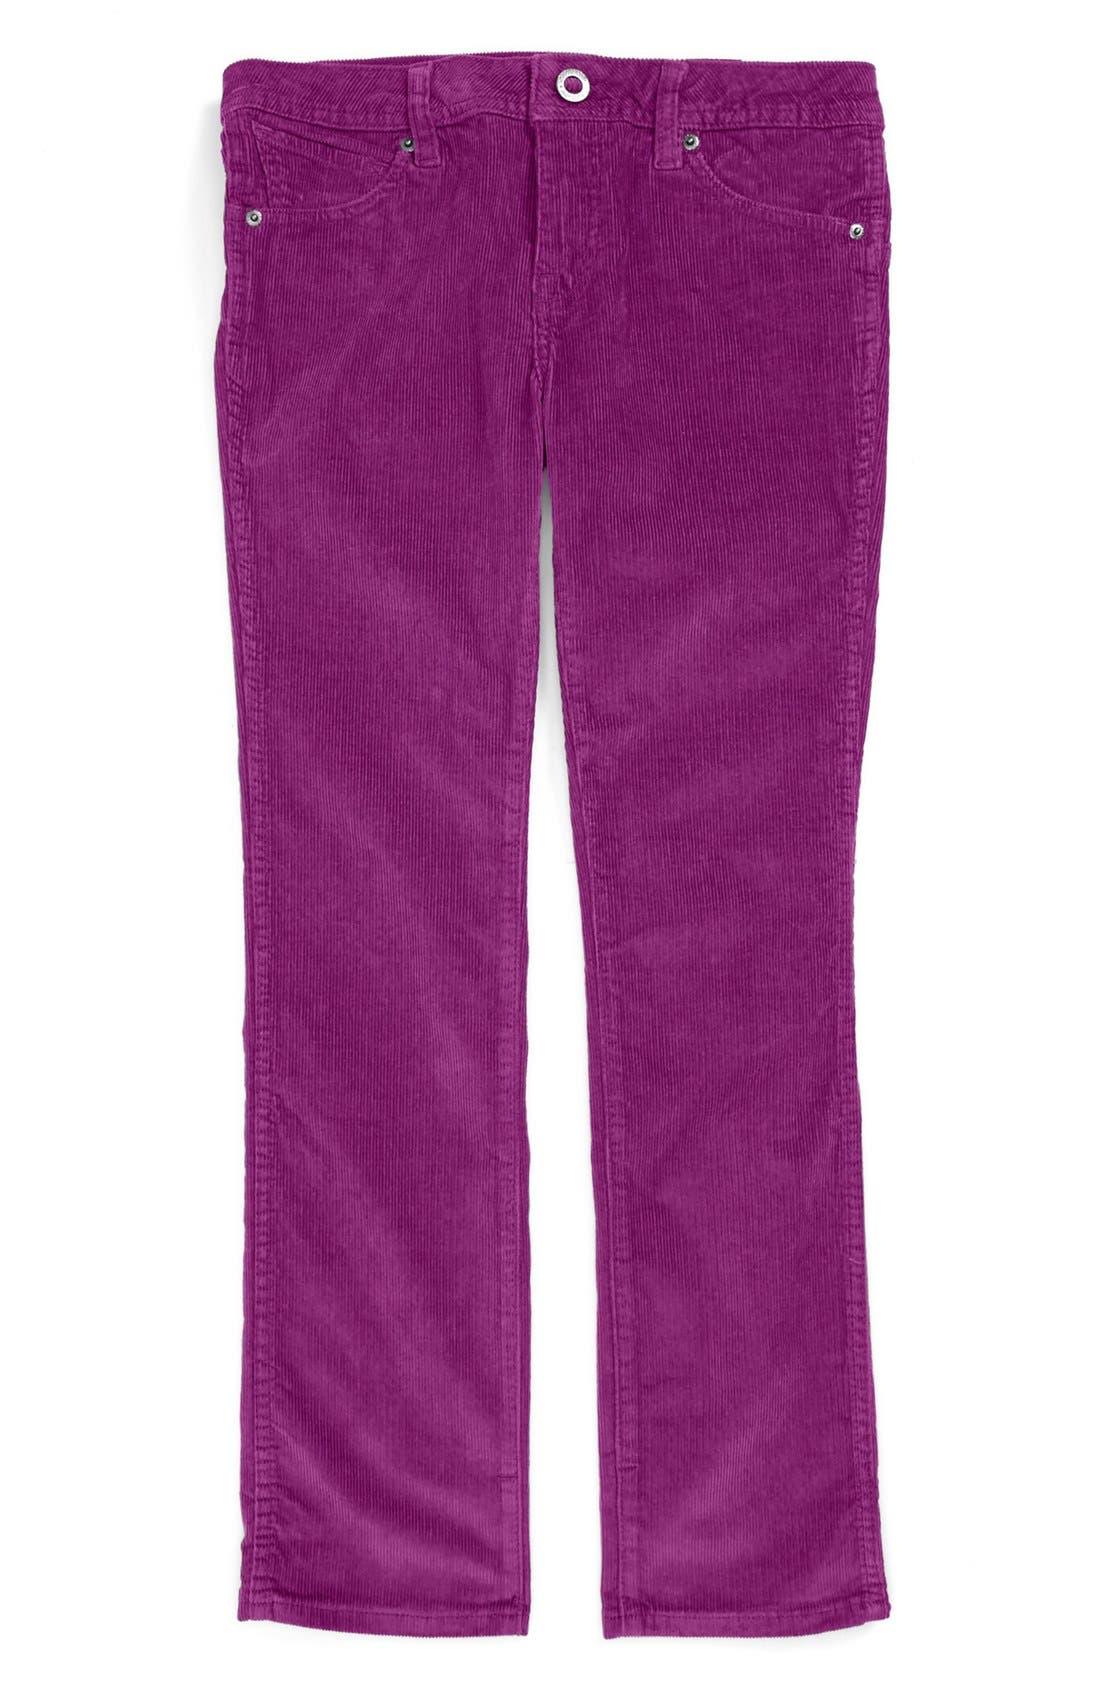 Alternate Image 1 Selected - Volcom '2X4' Corduroy Pants (Big Boys)